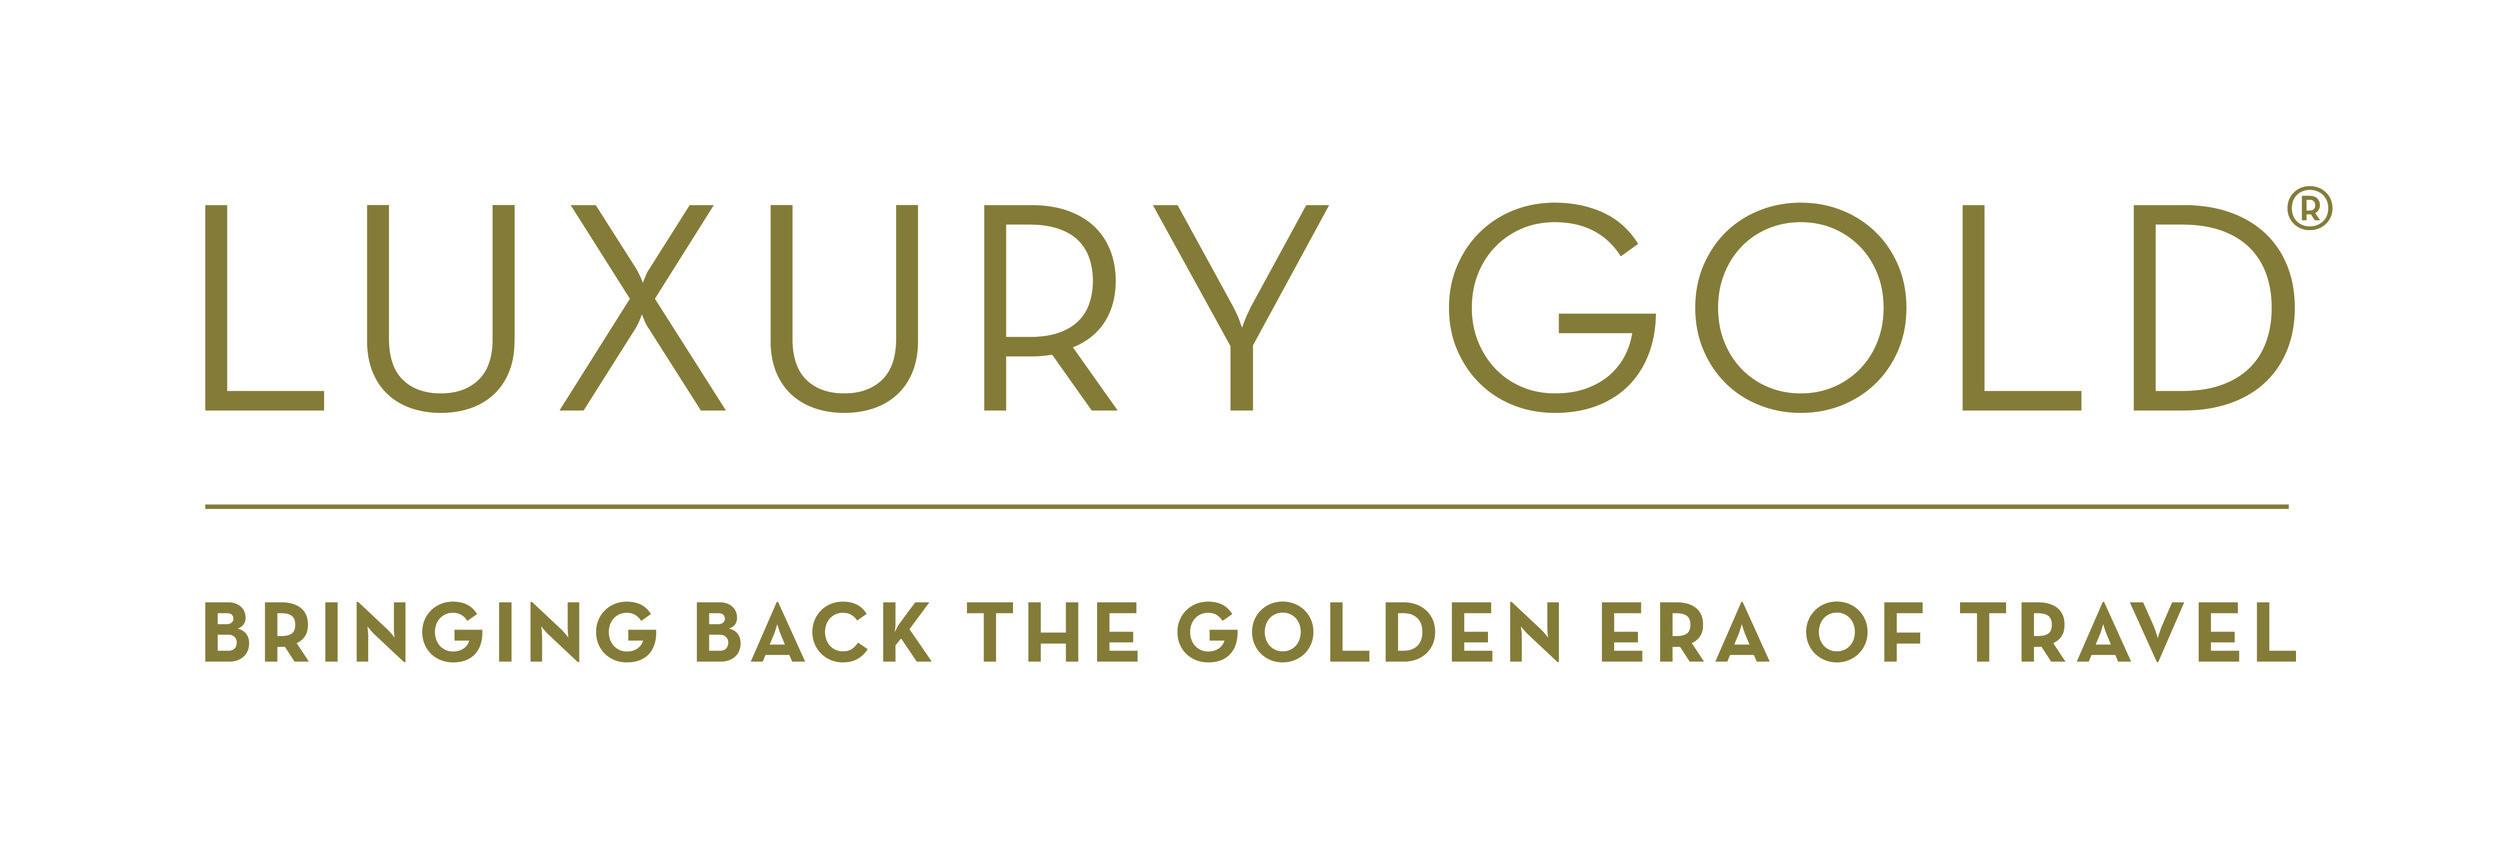 Luxury Gold logo.jpg